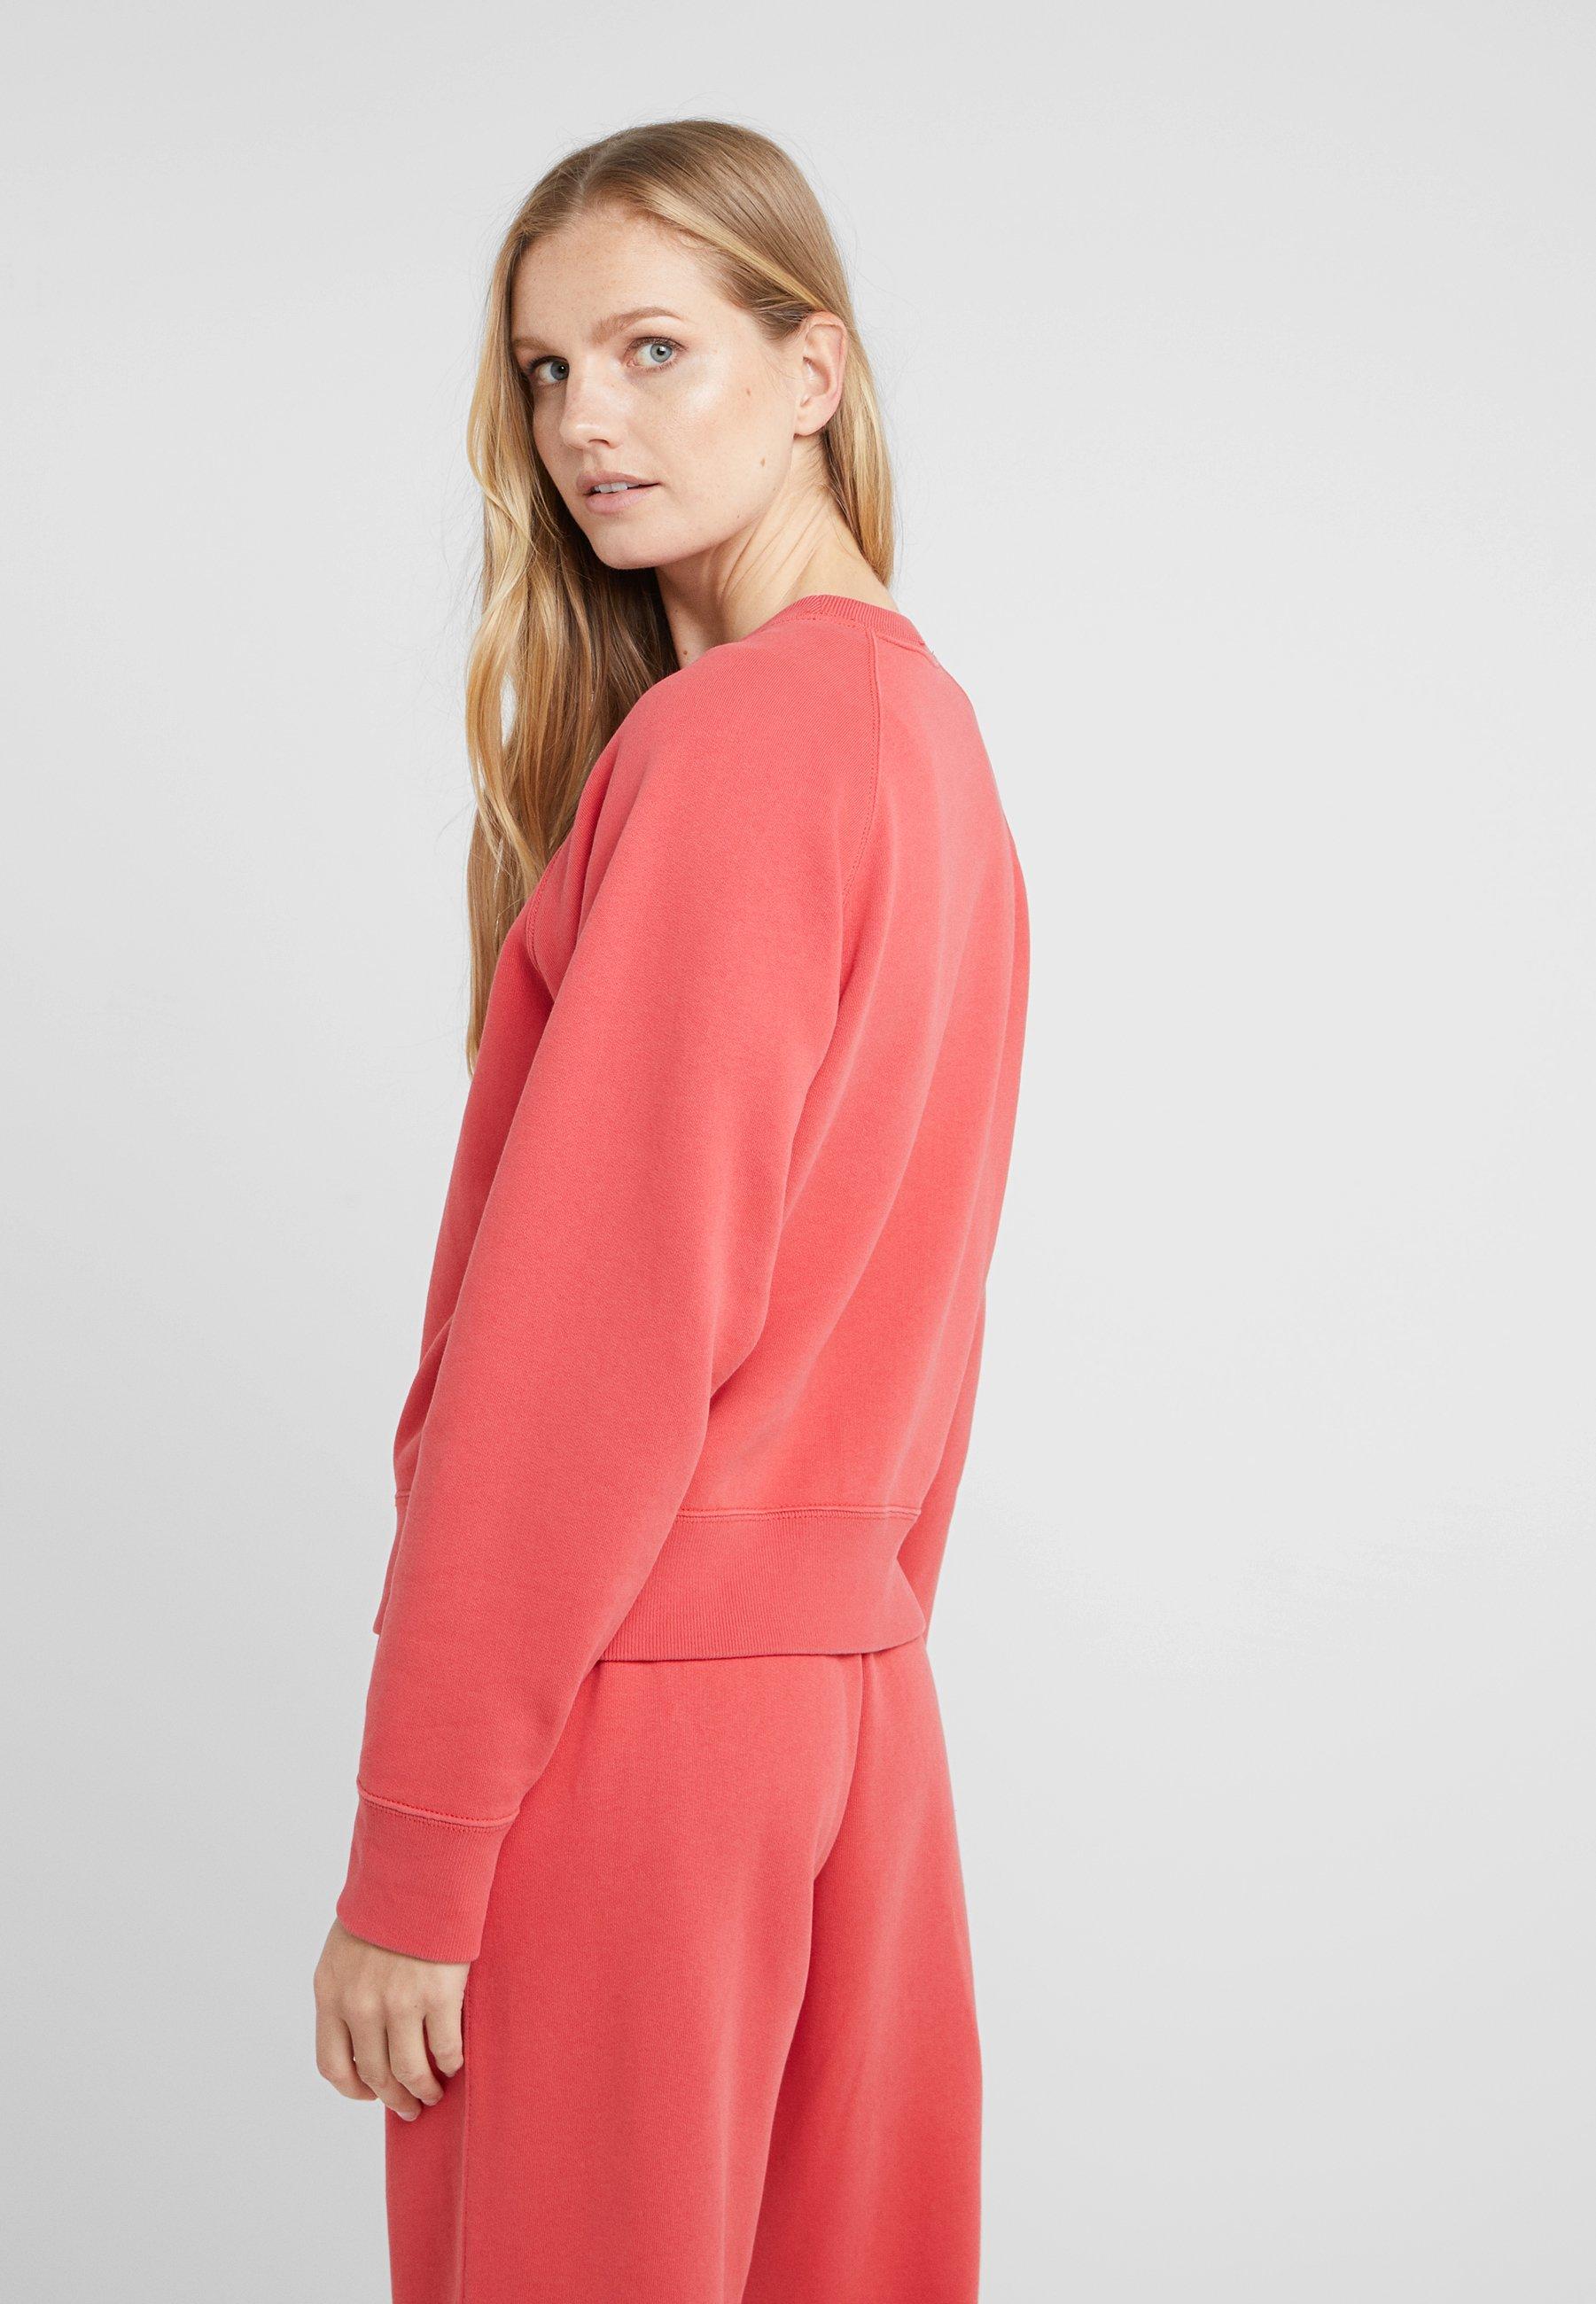 SeasonalSweatshirt Lauren Ralph Polo Spring Red 7g6bfyvIY